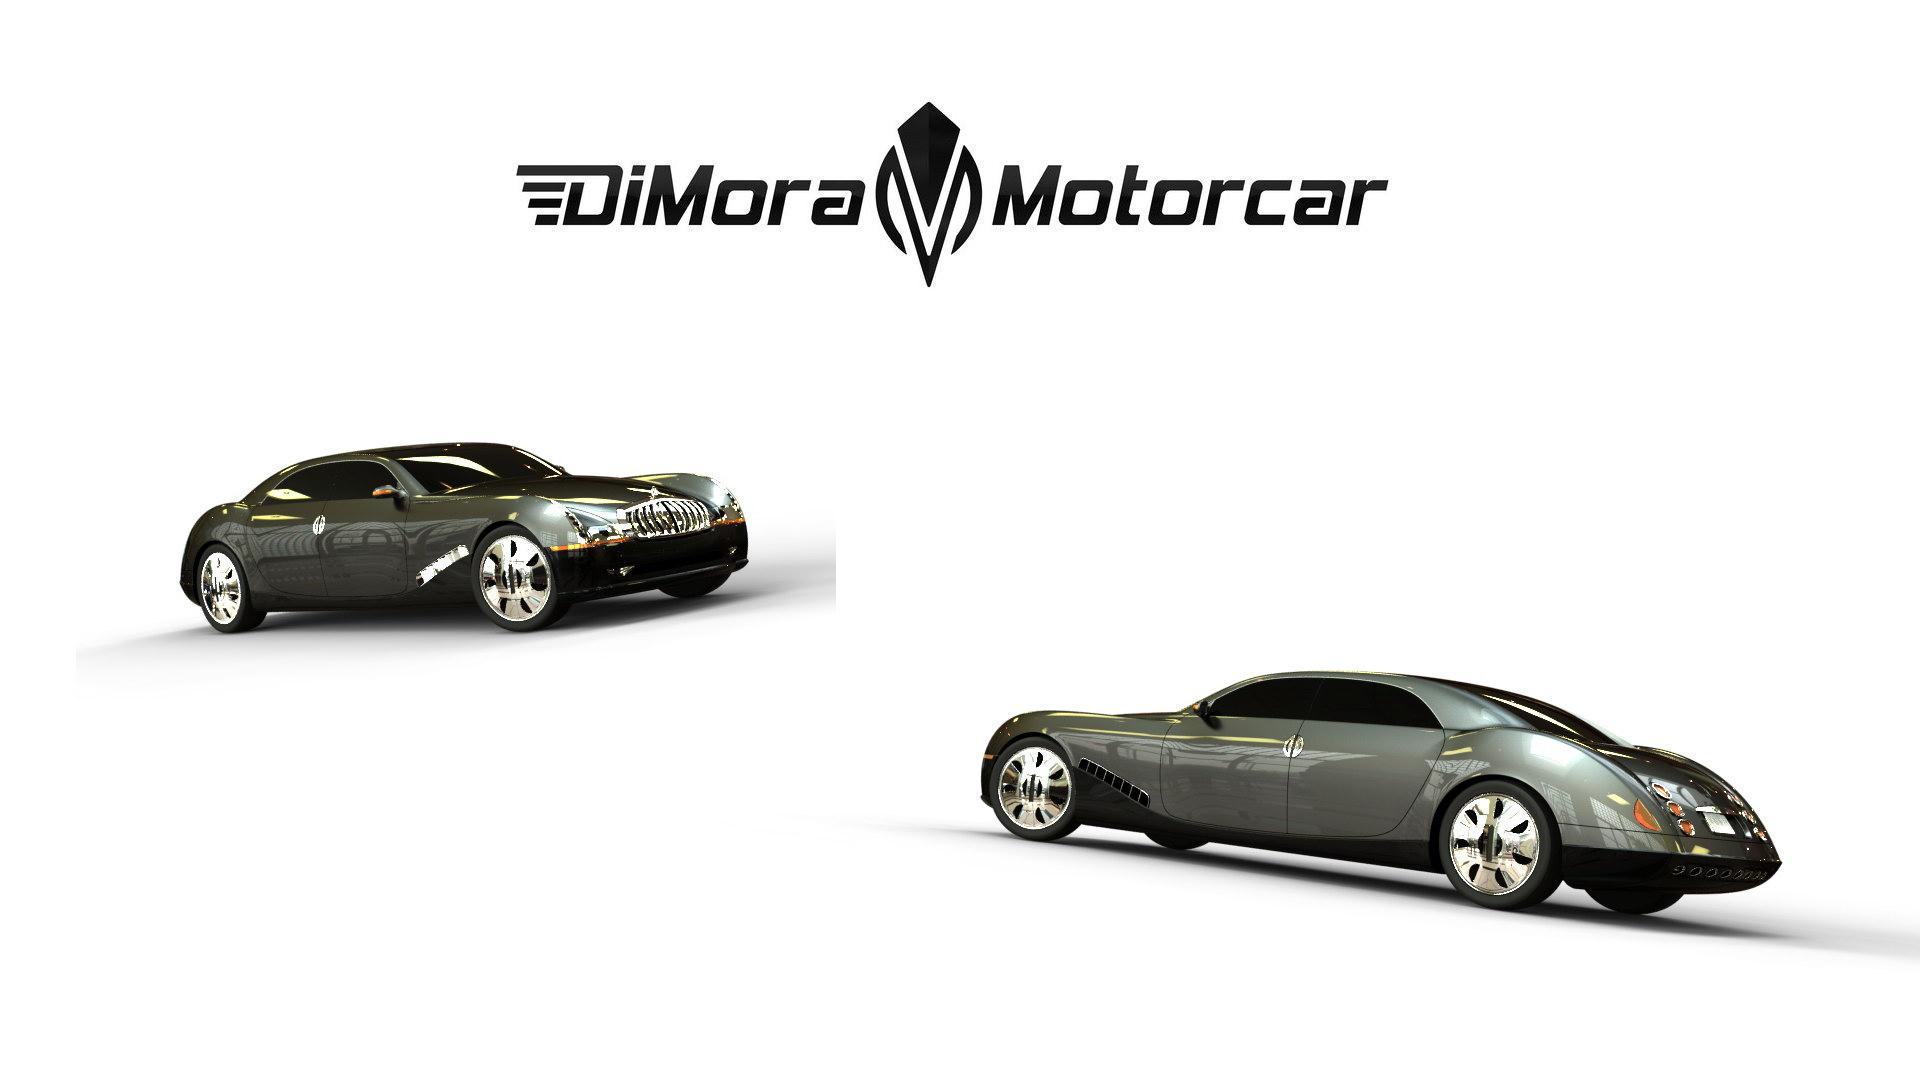 Brembo Brakes to Stop DiMora's 1200-Horsepower Motorcar